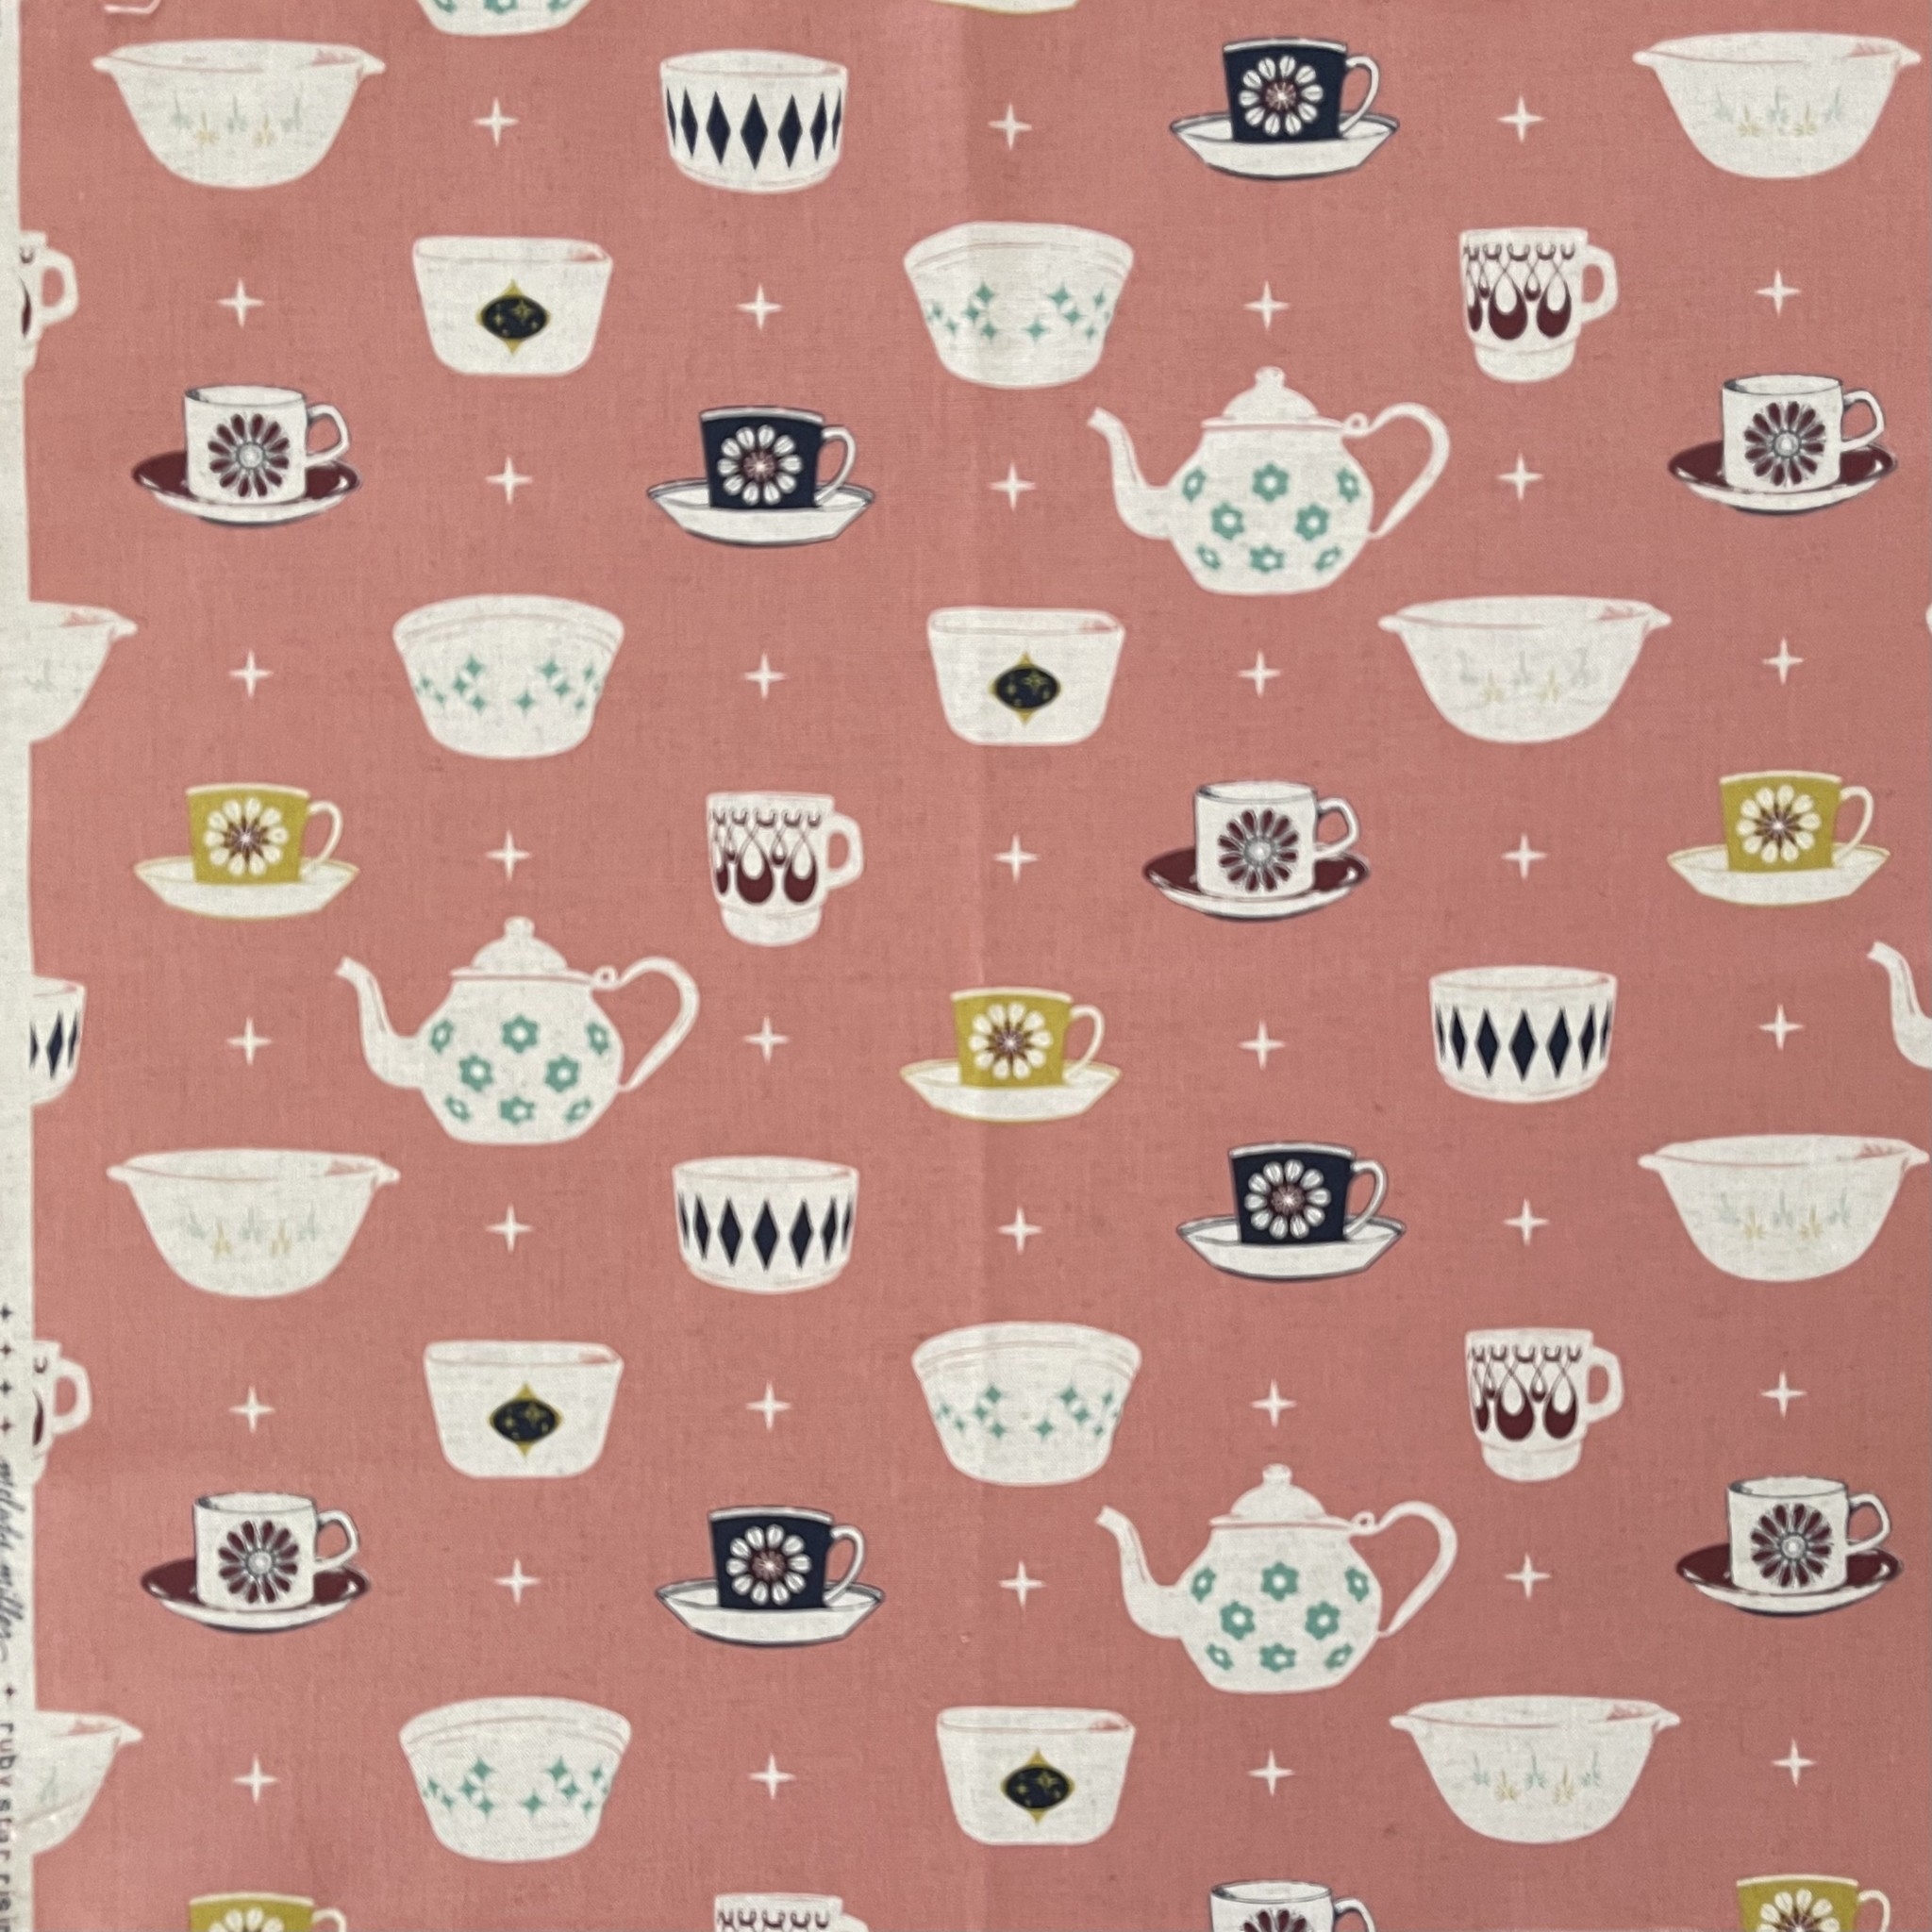 Vintage + Pre-Loved : Teacups in Pink by Melody Miller